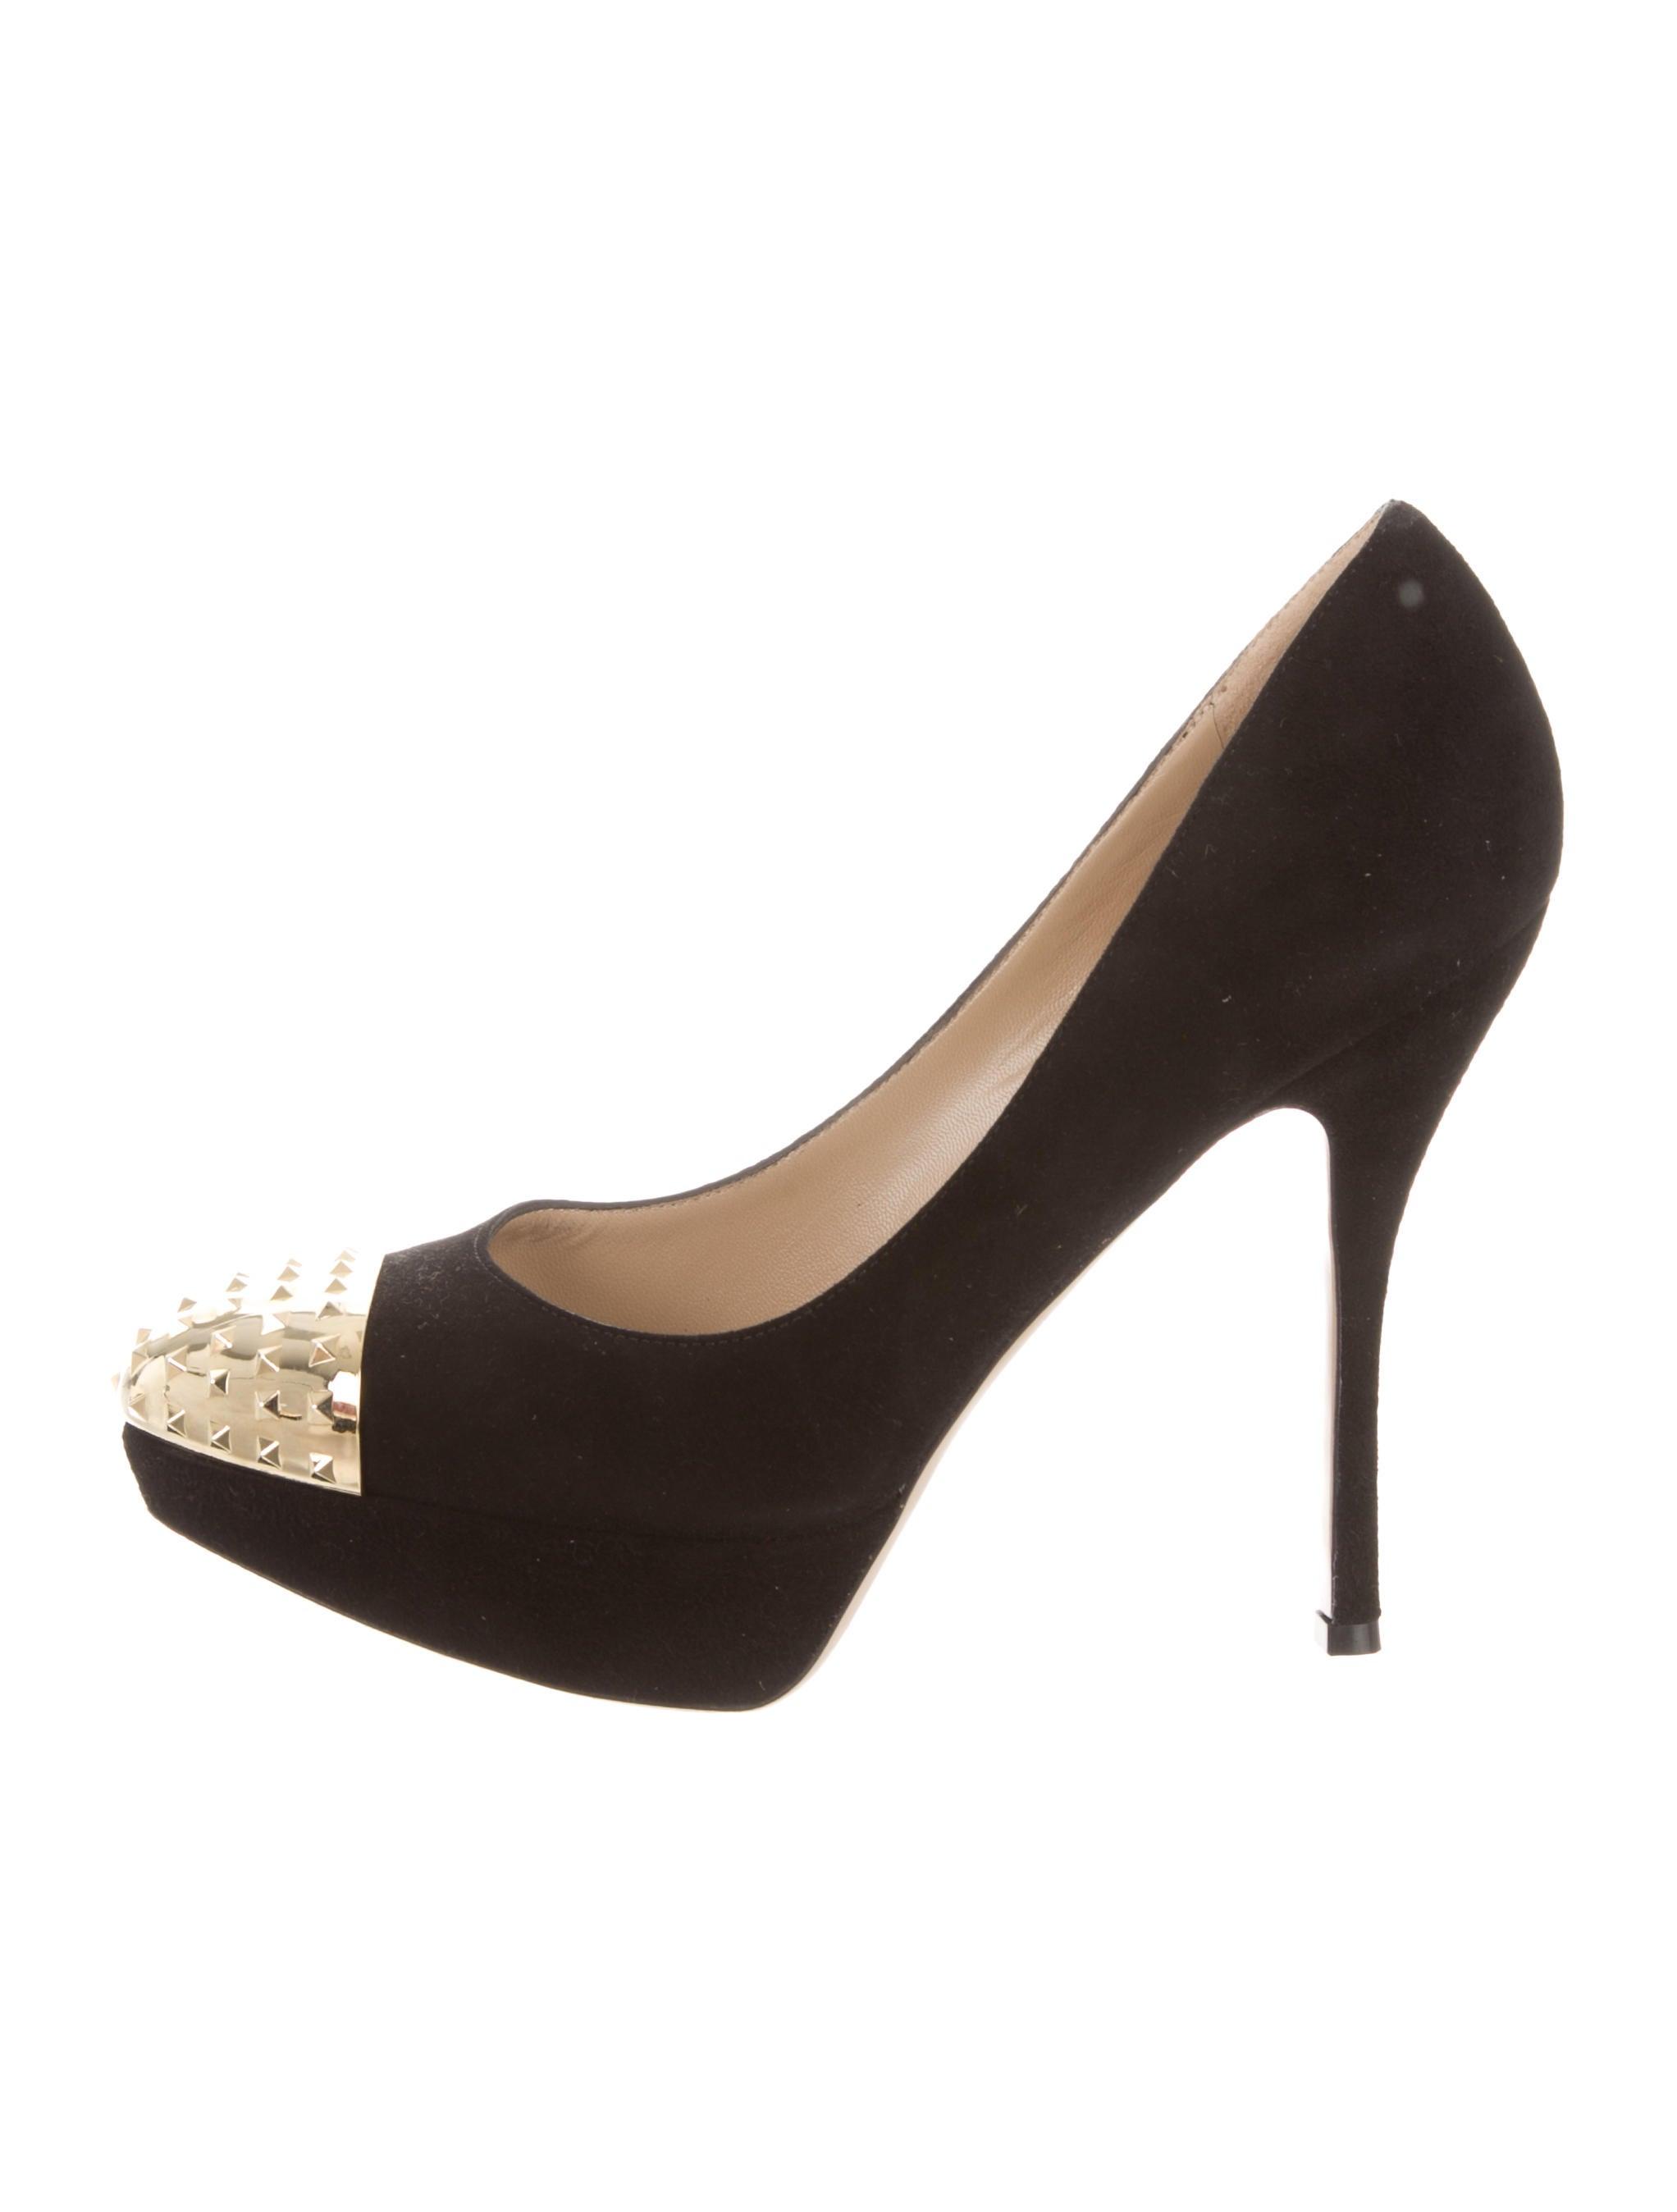 valentino suede platform pumps shoes val38284 the